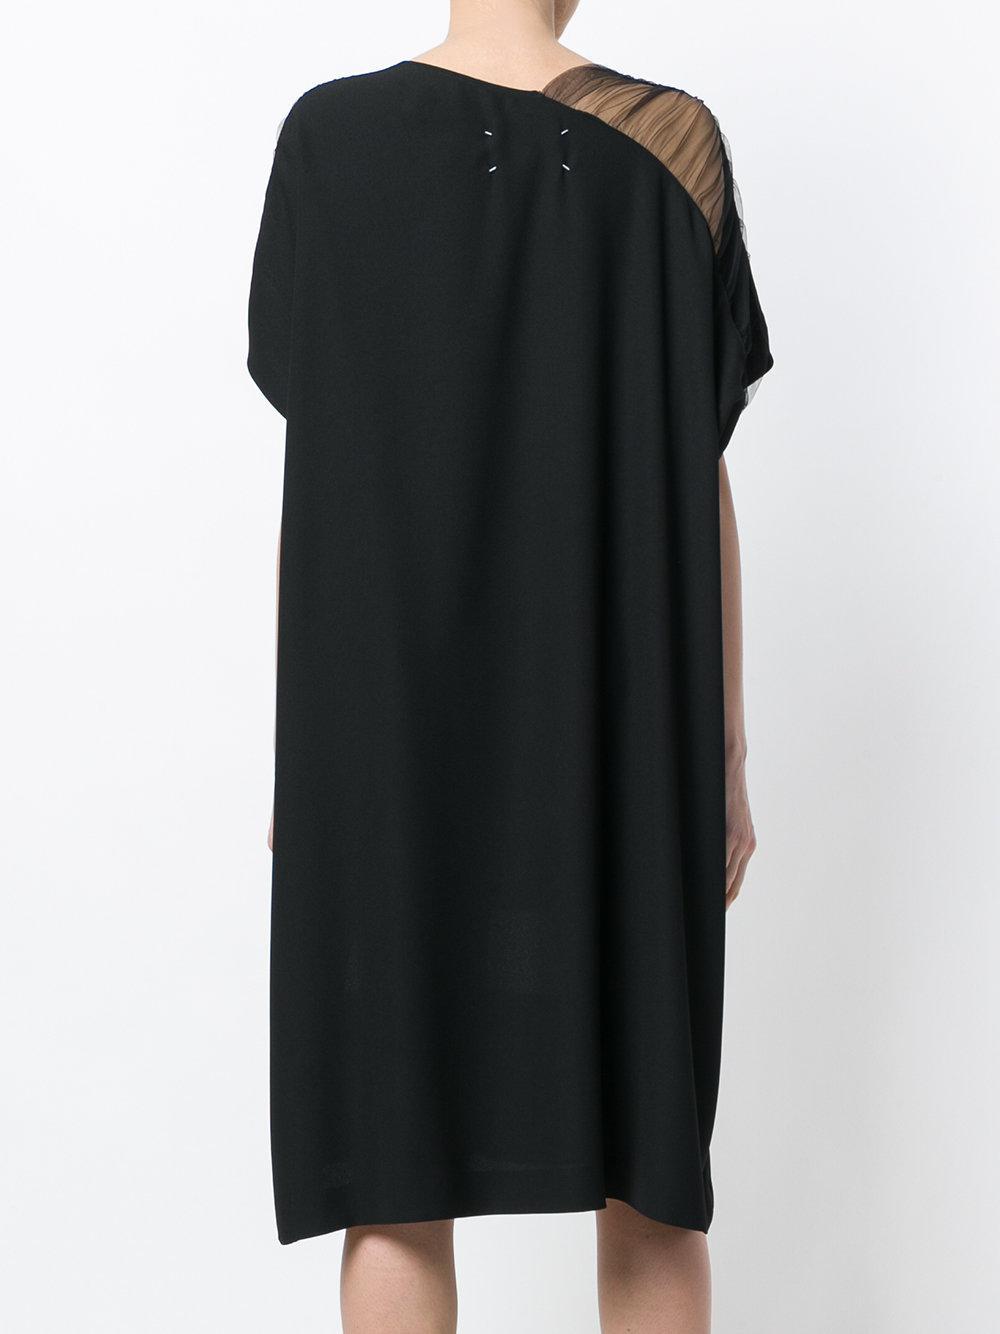 negro Margiela Maison de Lyst vestido con recto paneles CtxwAZxdq4